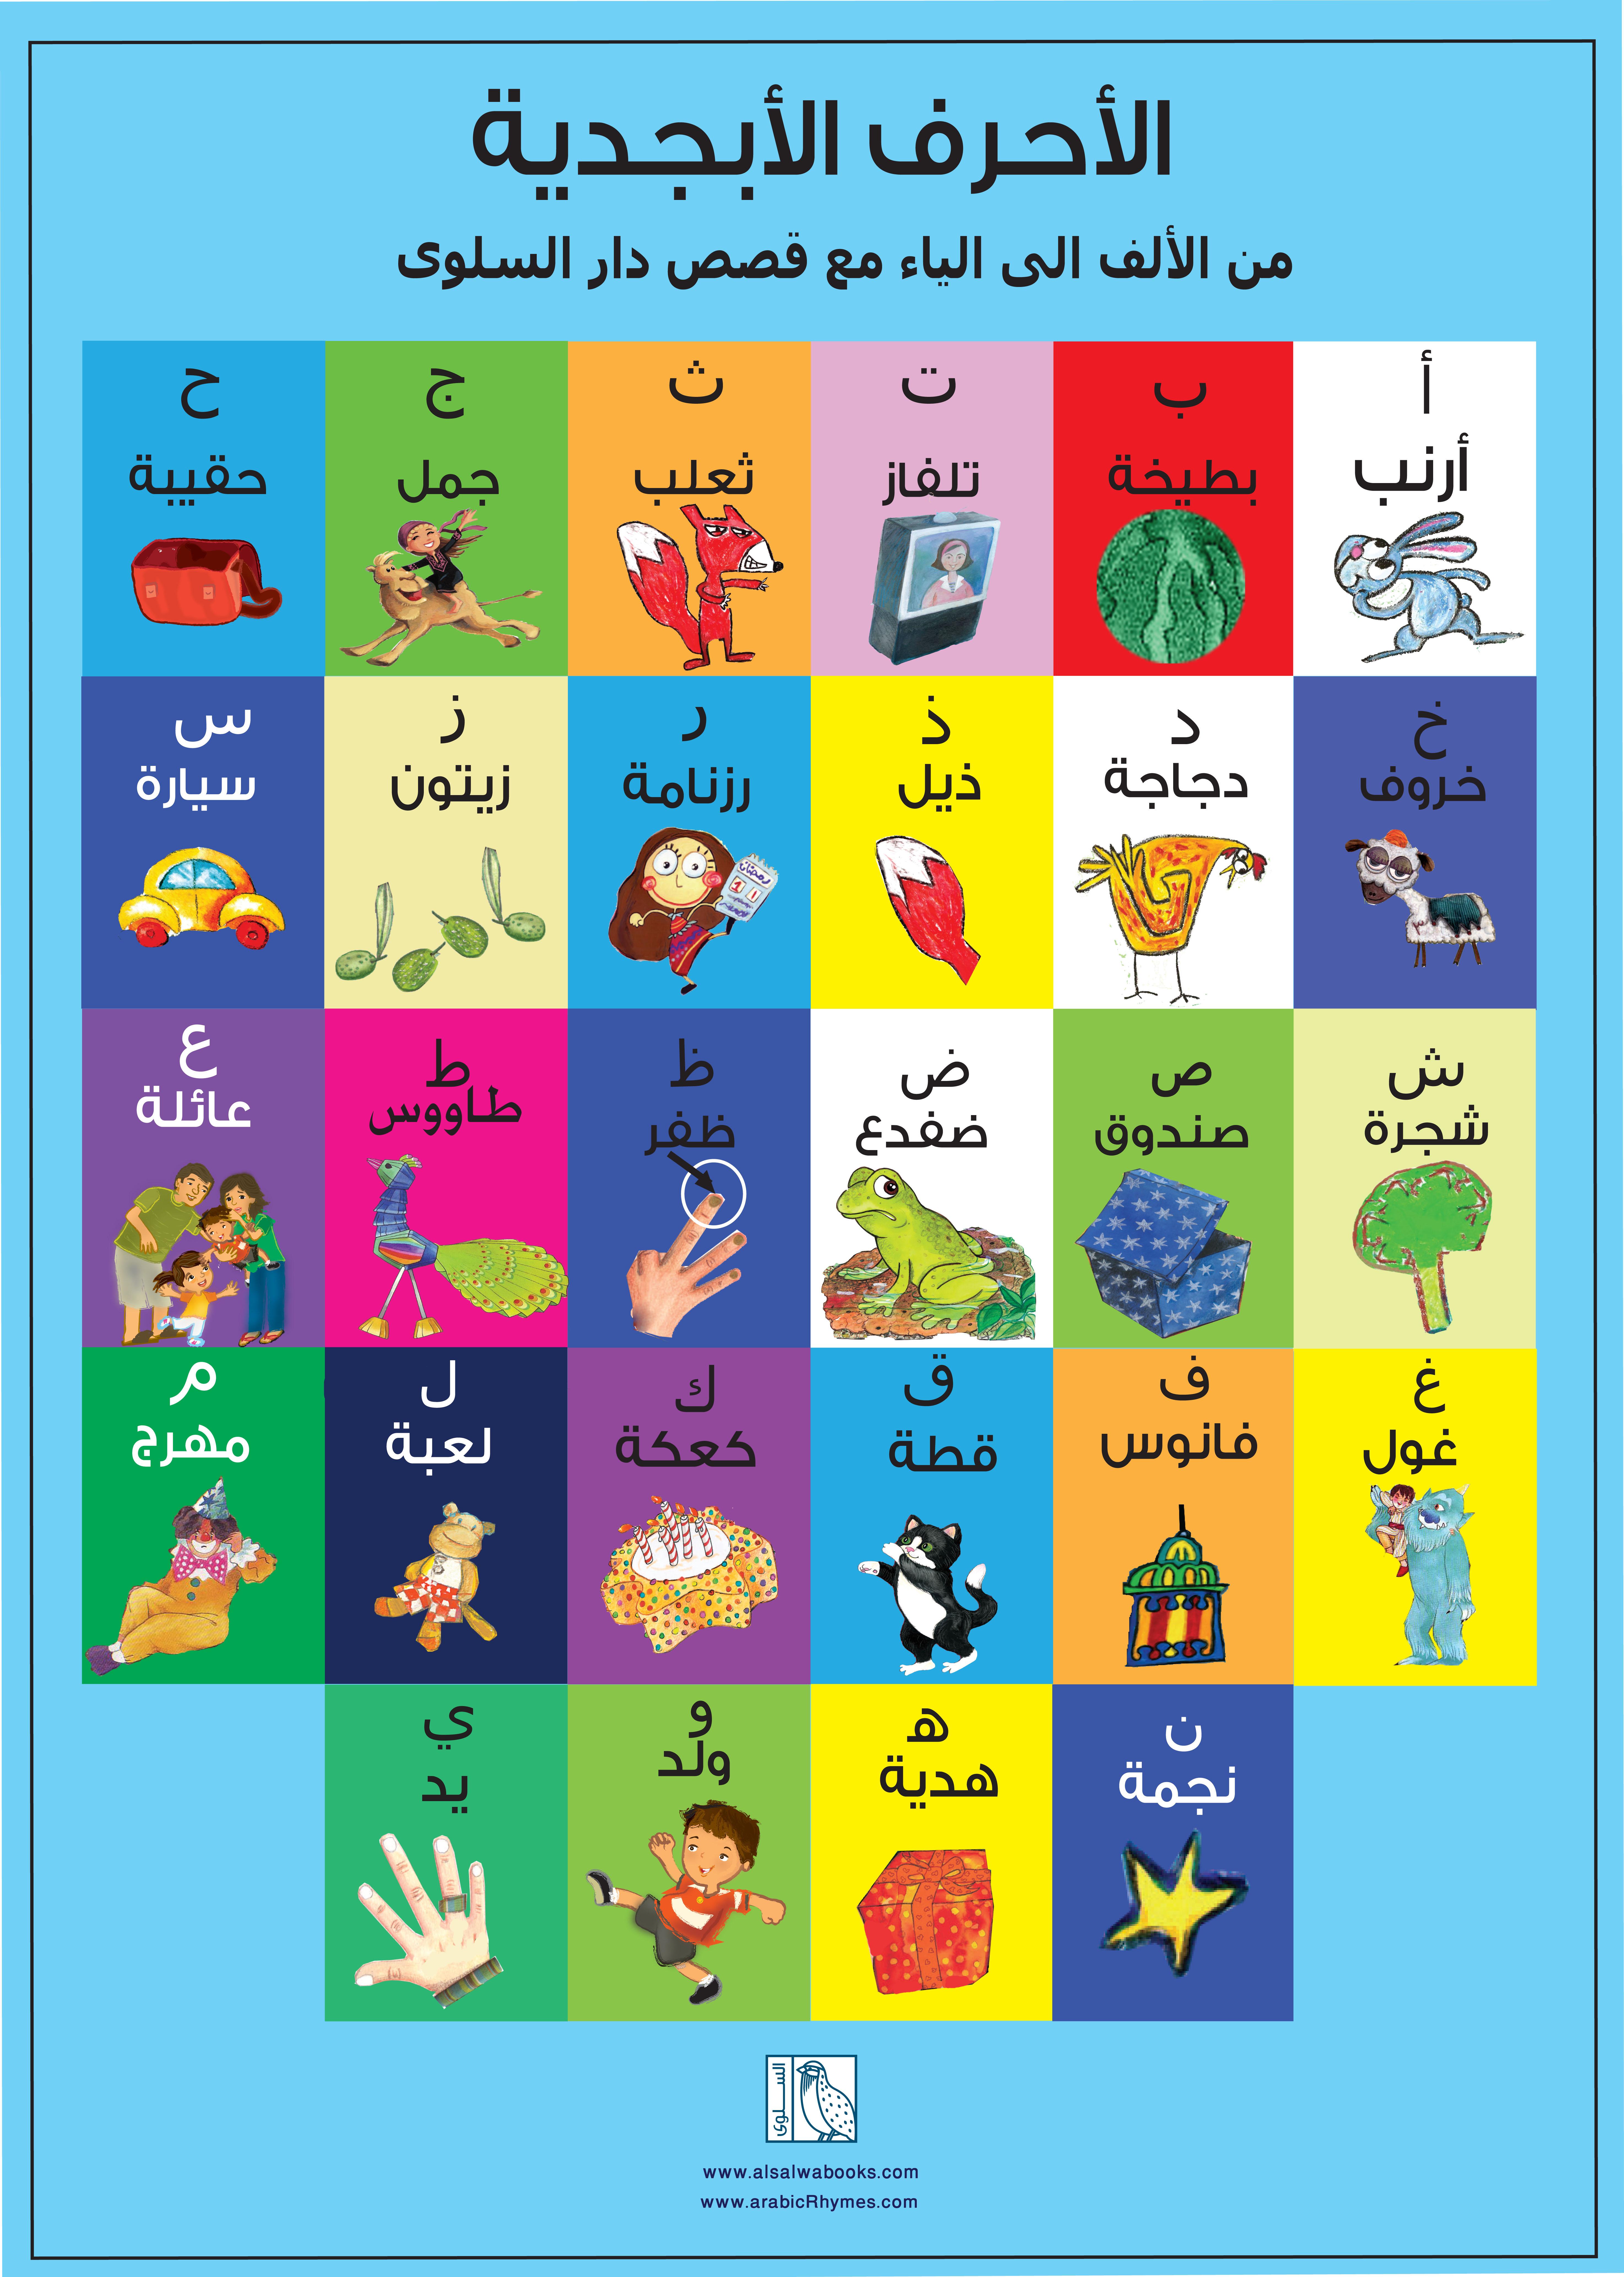 Free Arabic Alphabet Cliparts Download Free Clip Art